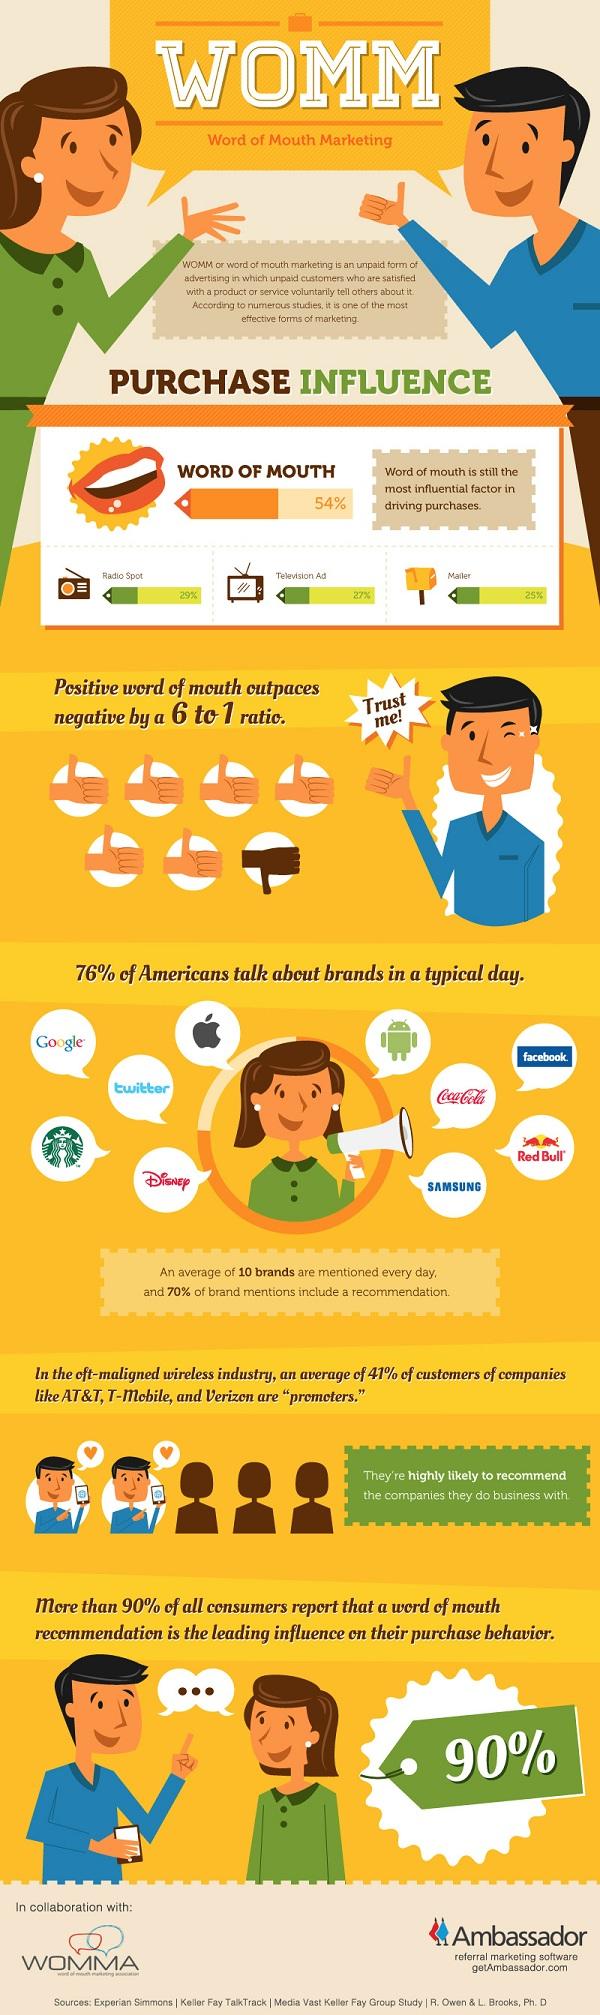 Marketing boca a boca #infografia #infographic #marketing #socialmedia - TICs y Formación